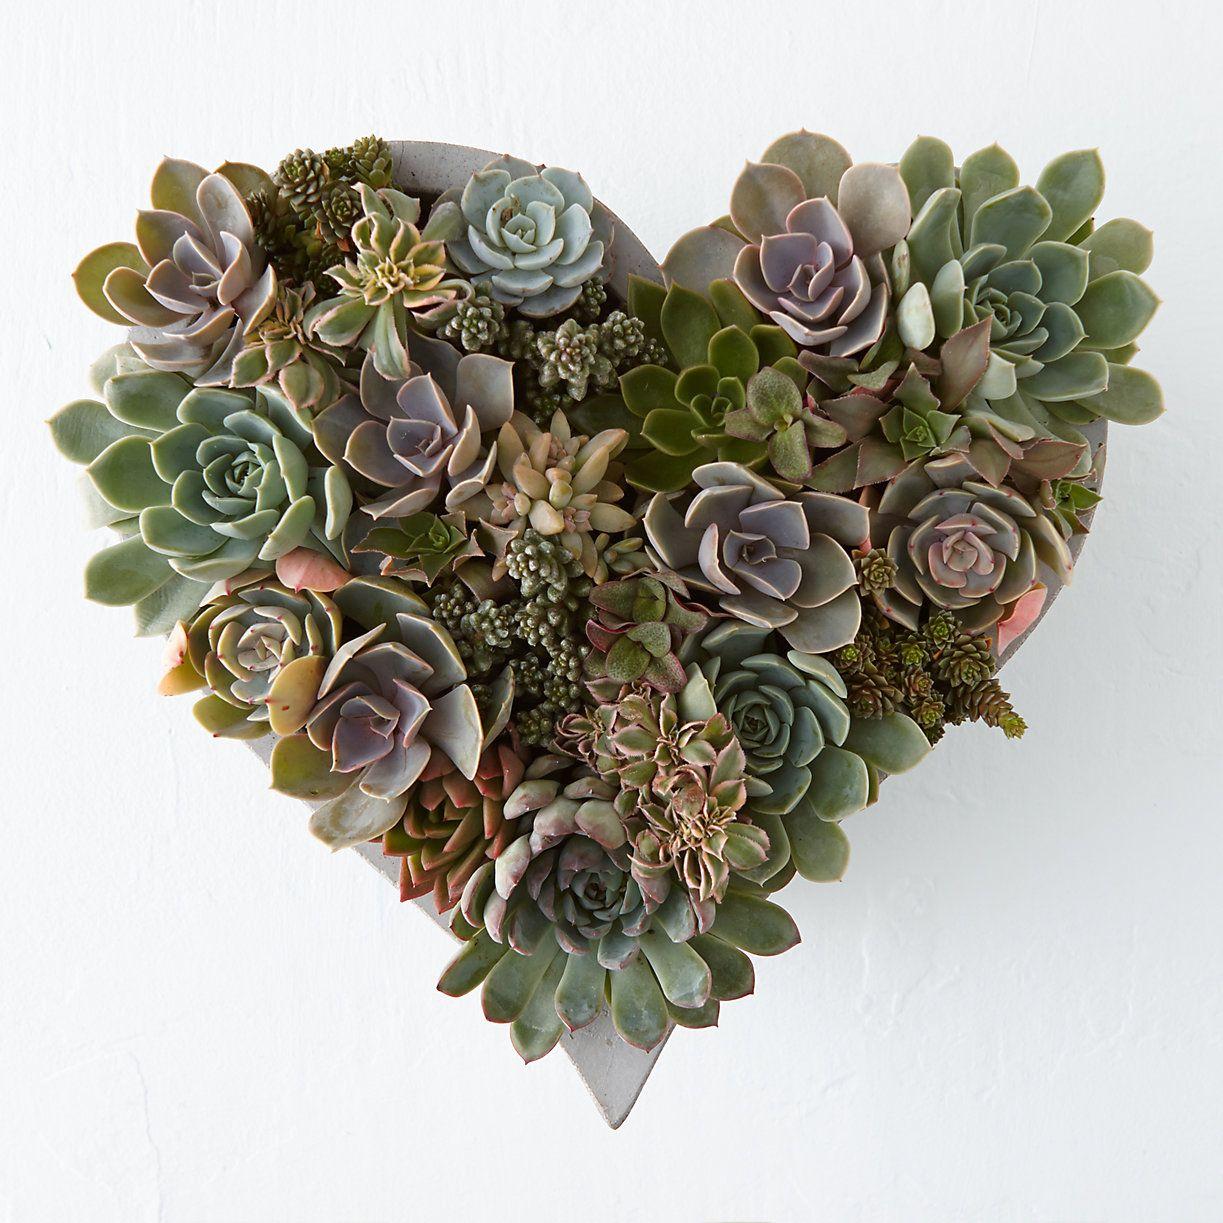 Succulent Heart Garden In Valentines + Gifts Blooming